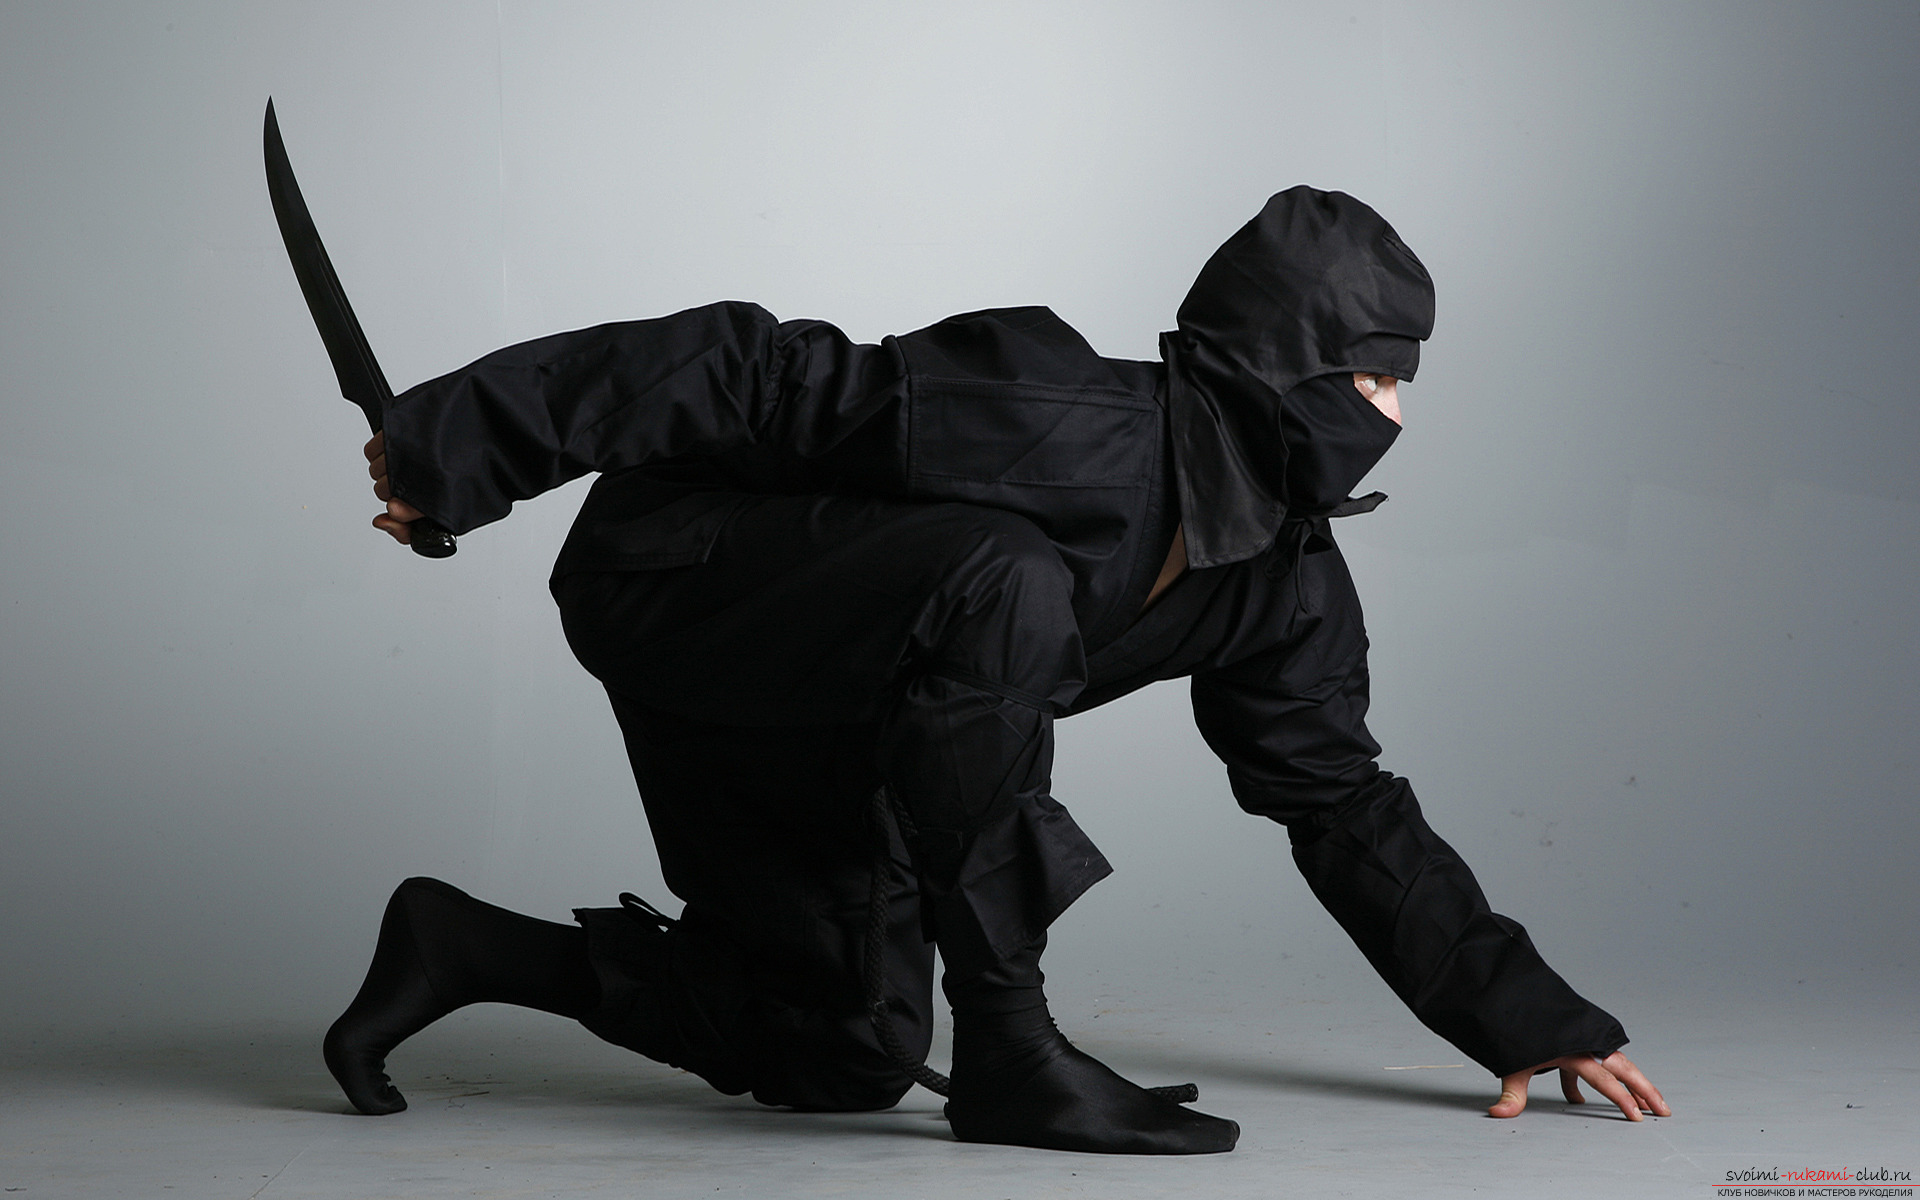 Костюм ниндзя для вечеринки. Кройка и фото костюма своими руками.. Фото №2